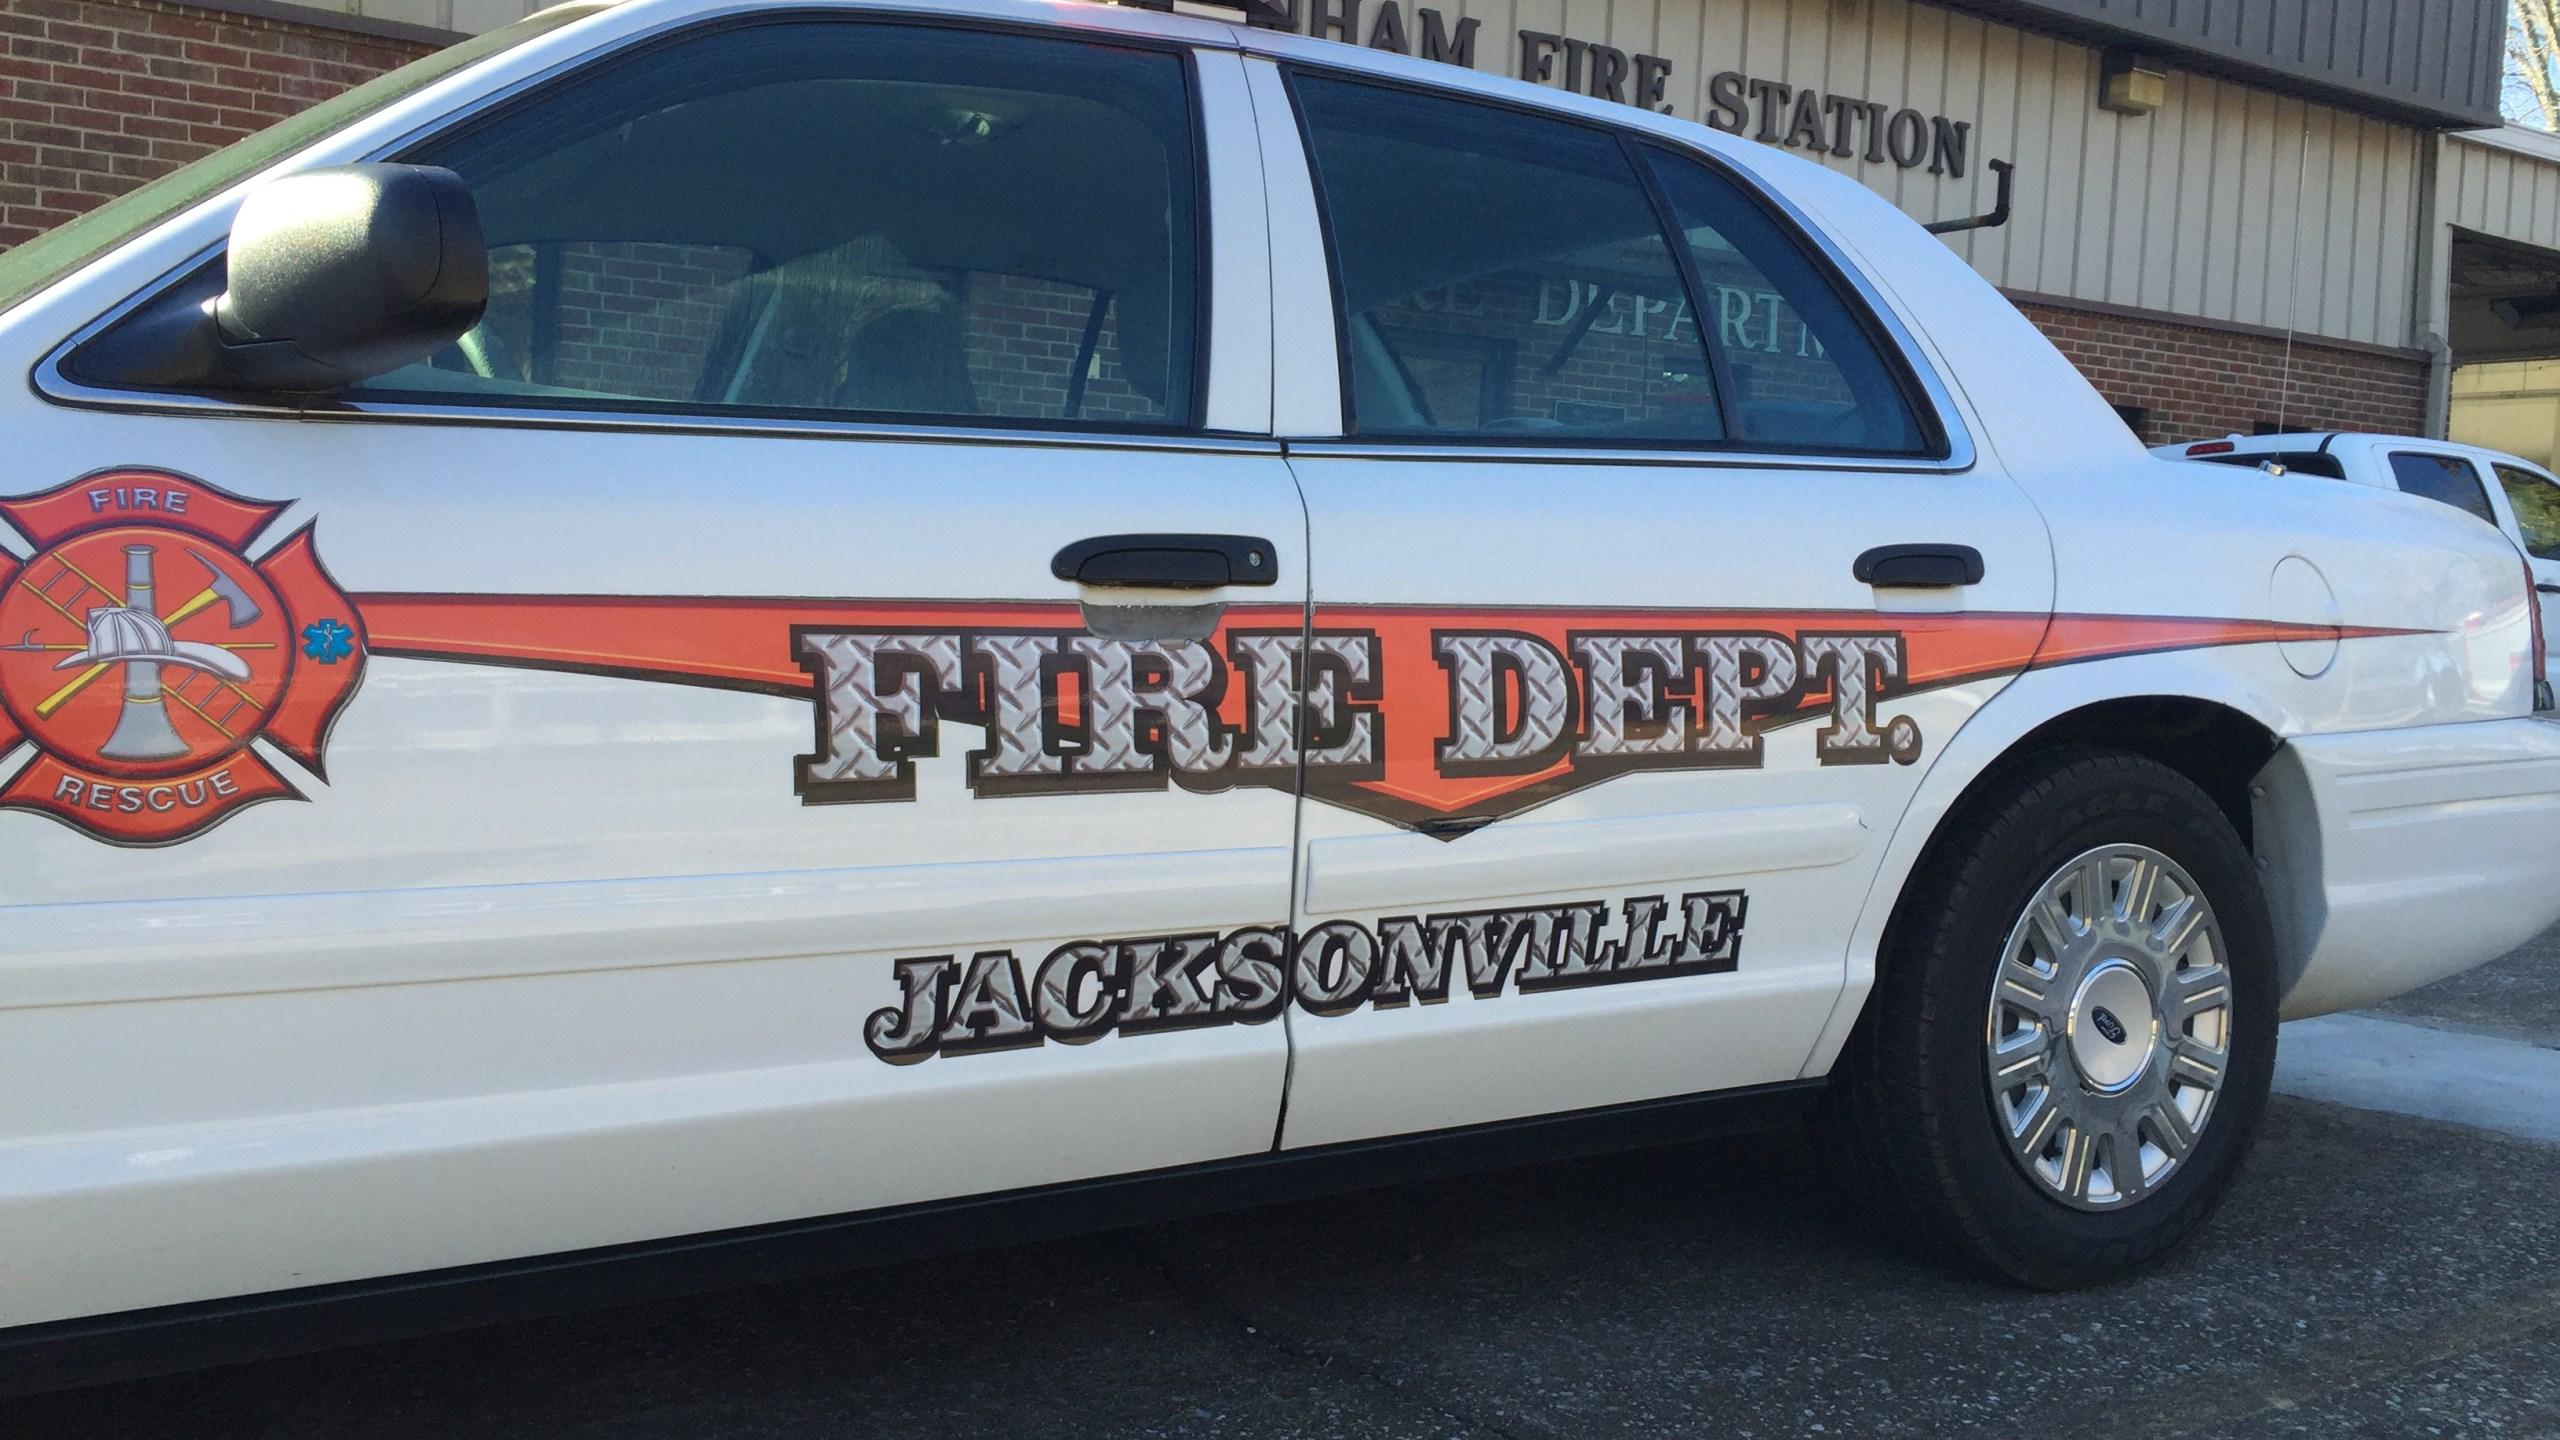 Jacksonville Fire Department_153470